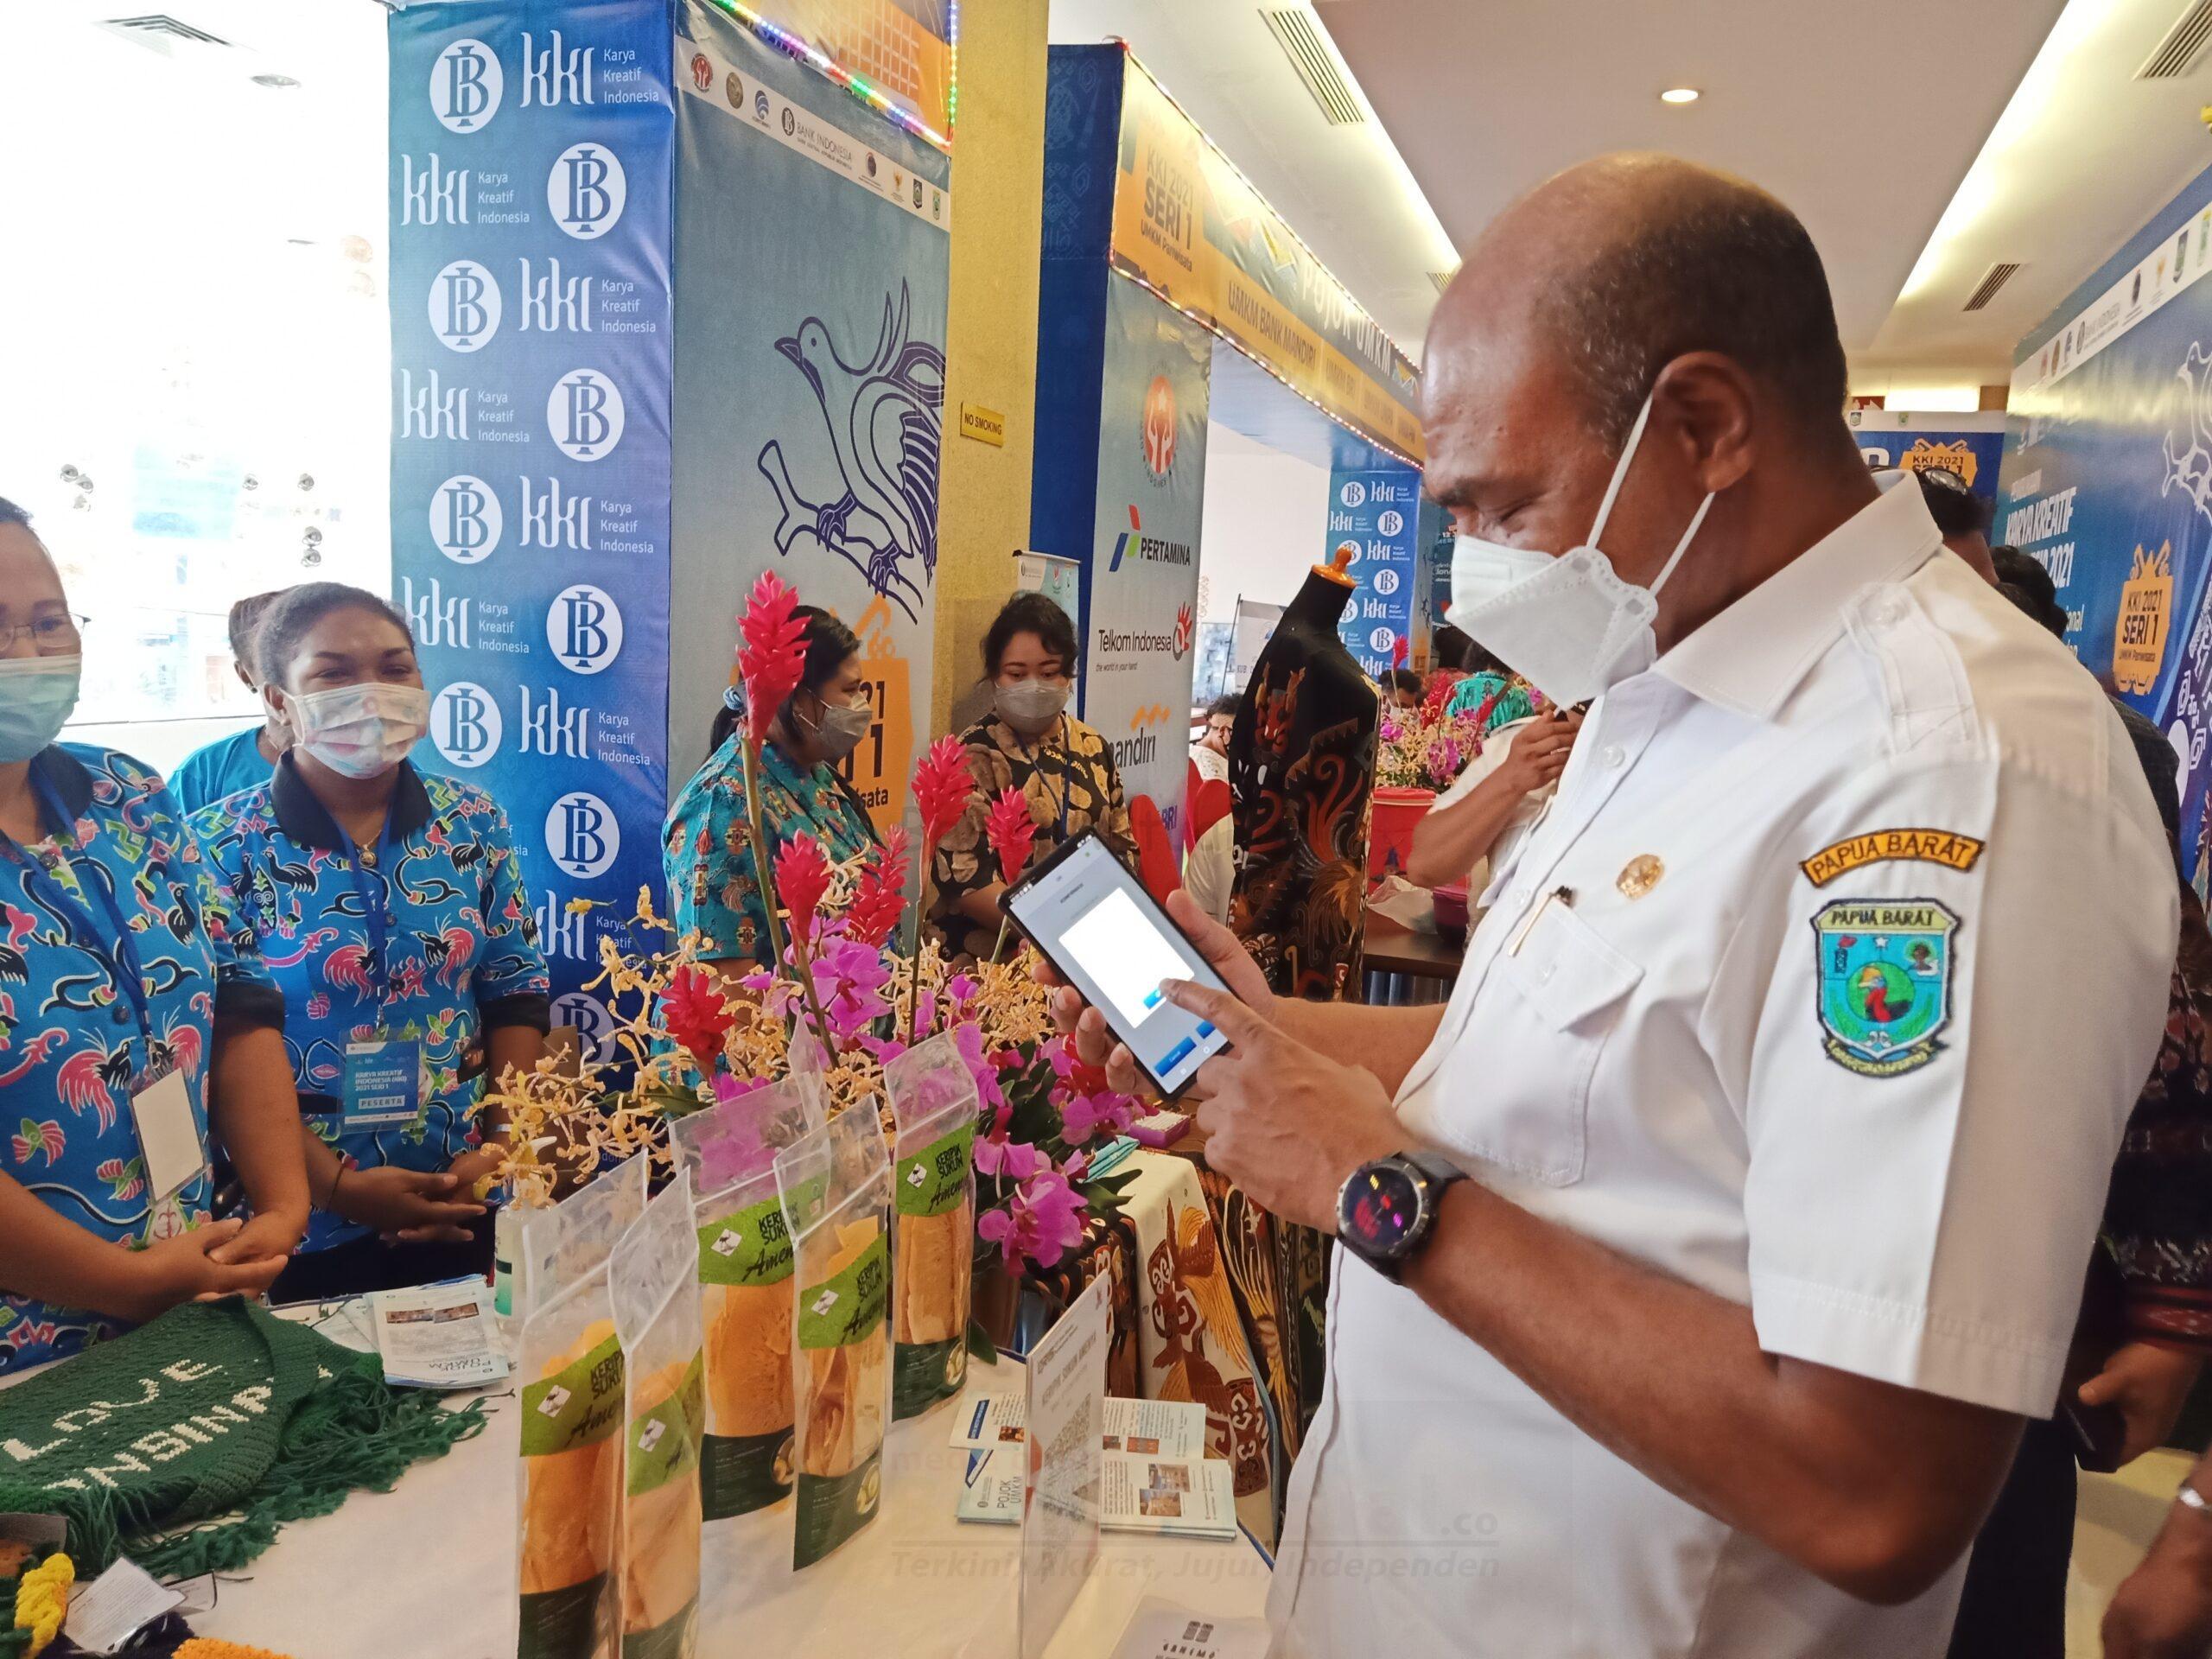 Bank Indonesia Hadirkan Produk Unggulan UMKM PB Karya Kreatif Indonesia 2021 23 IMG20210303122241 scaled